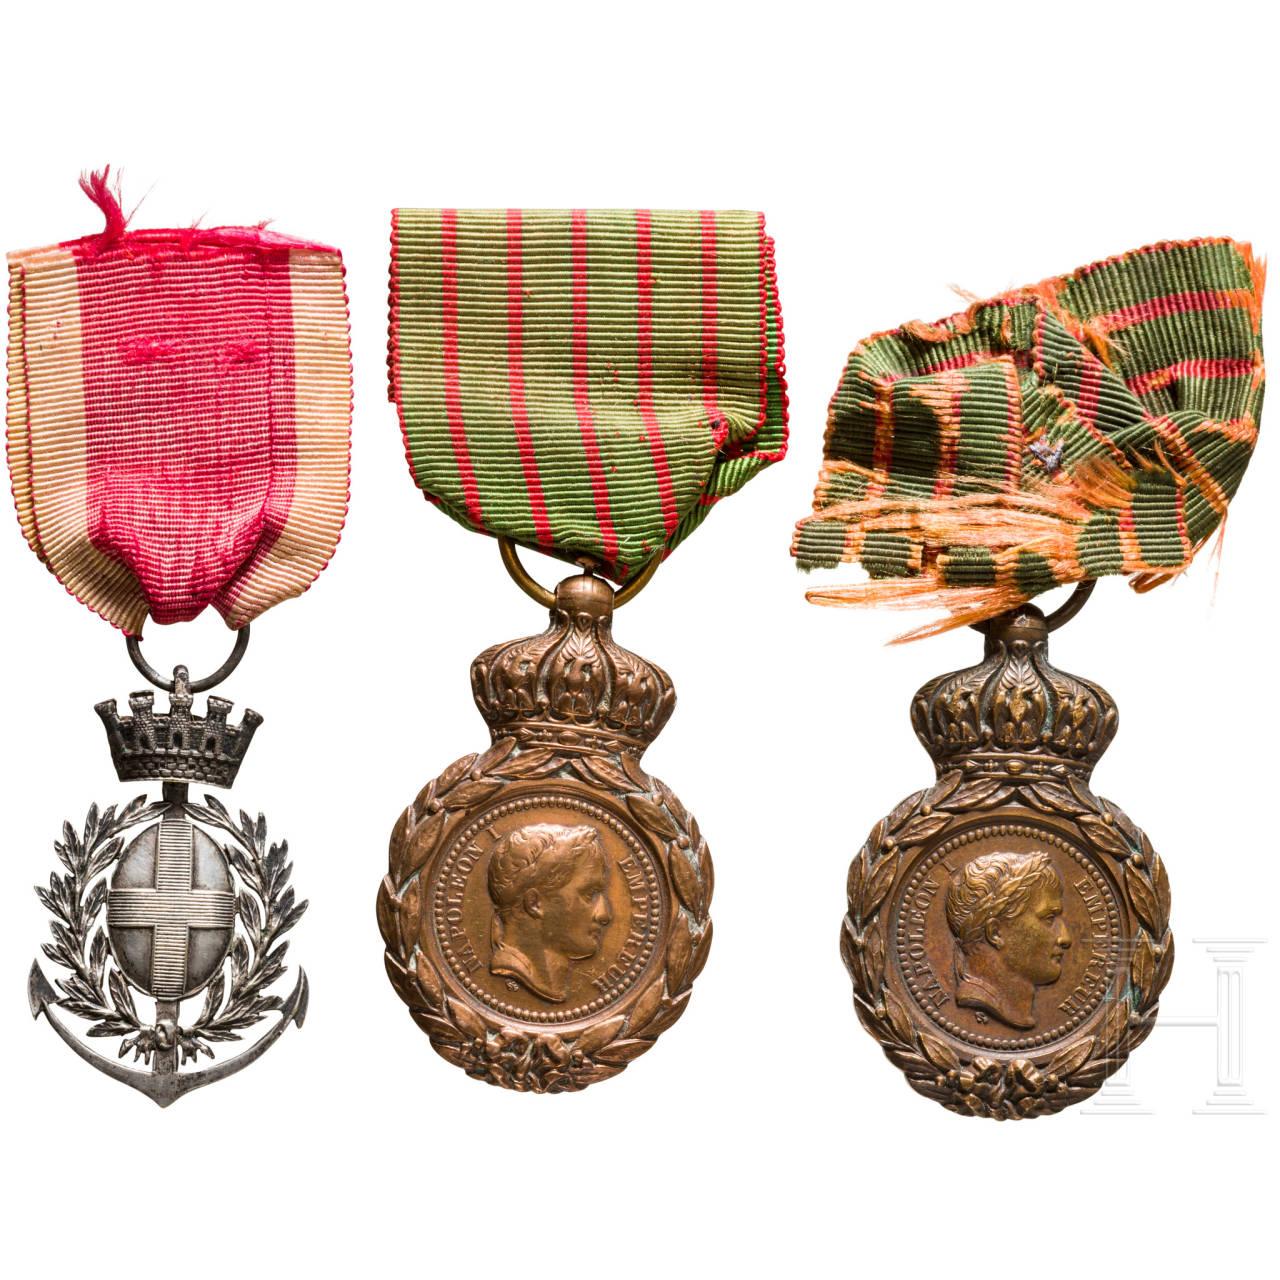 Three medals, France, 19th century